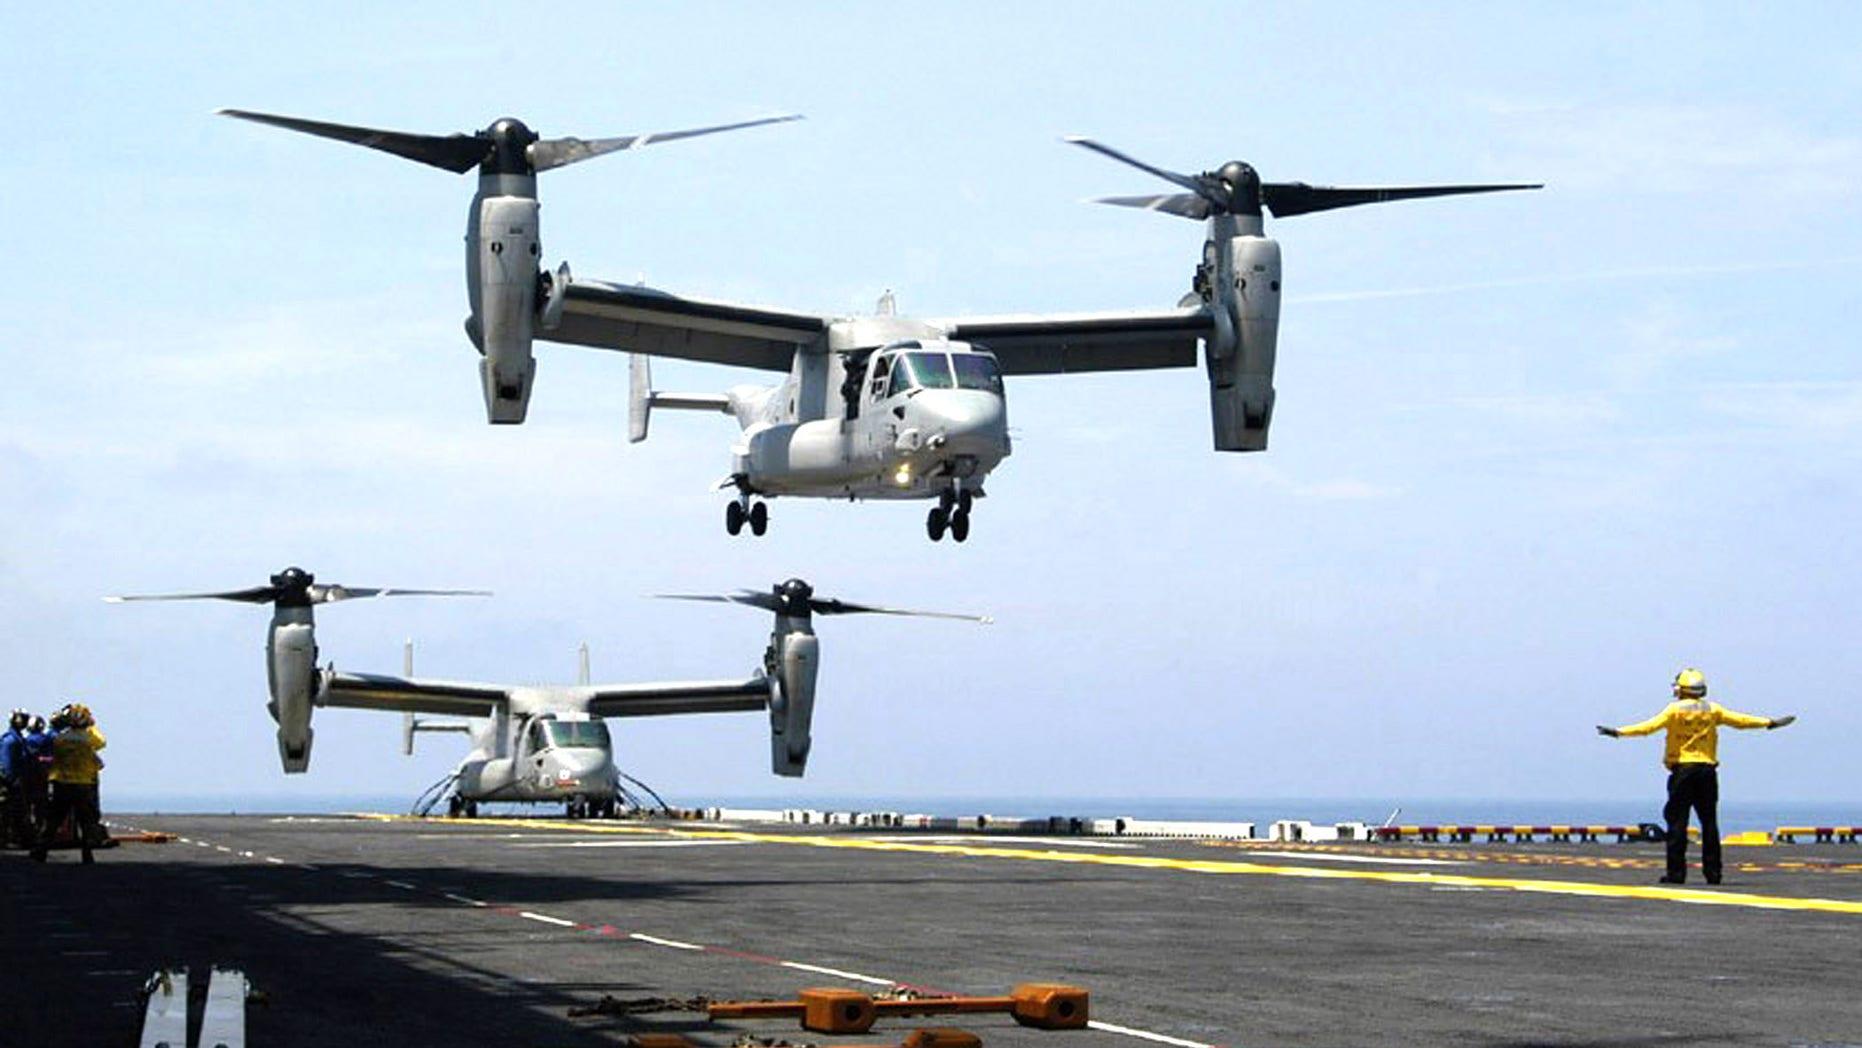 V-22 Osprey aircraft operate in close proximity during recent flight deck developmental testing.